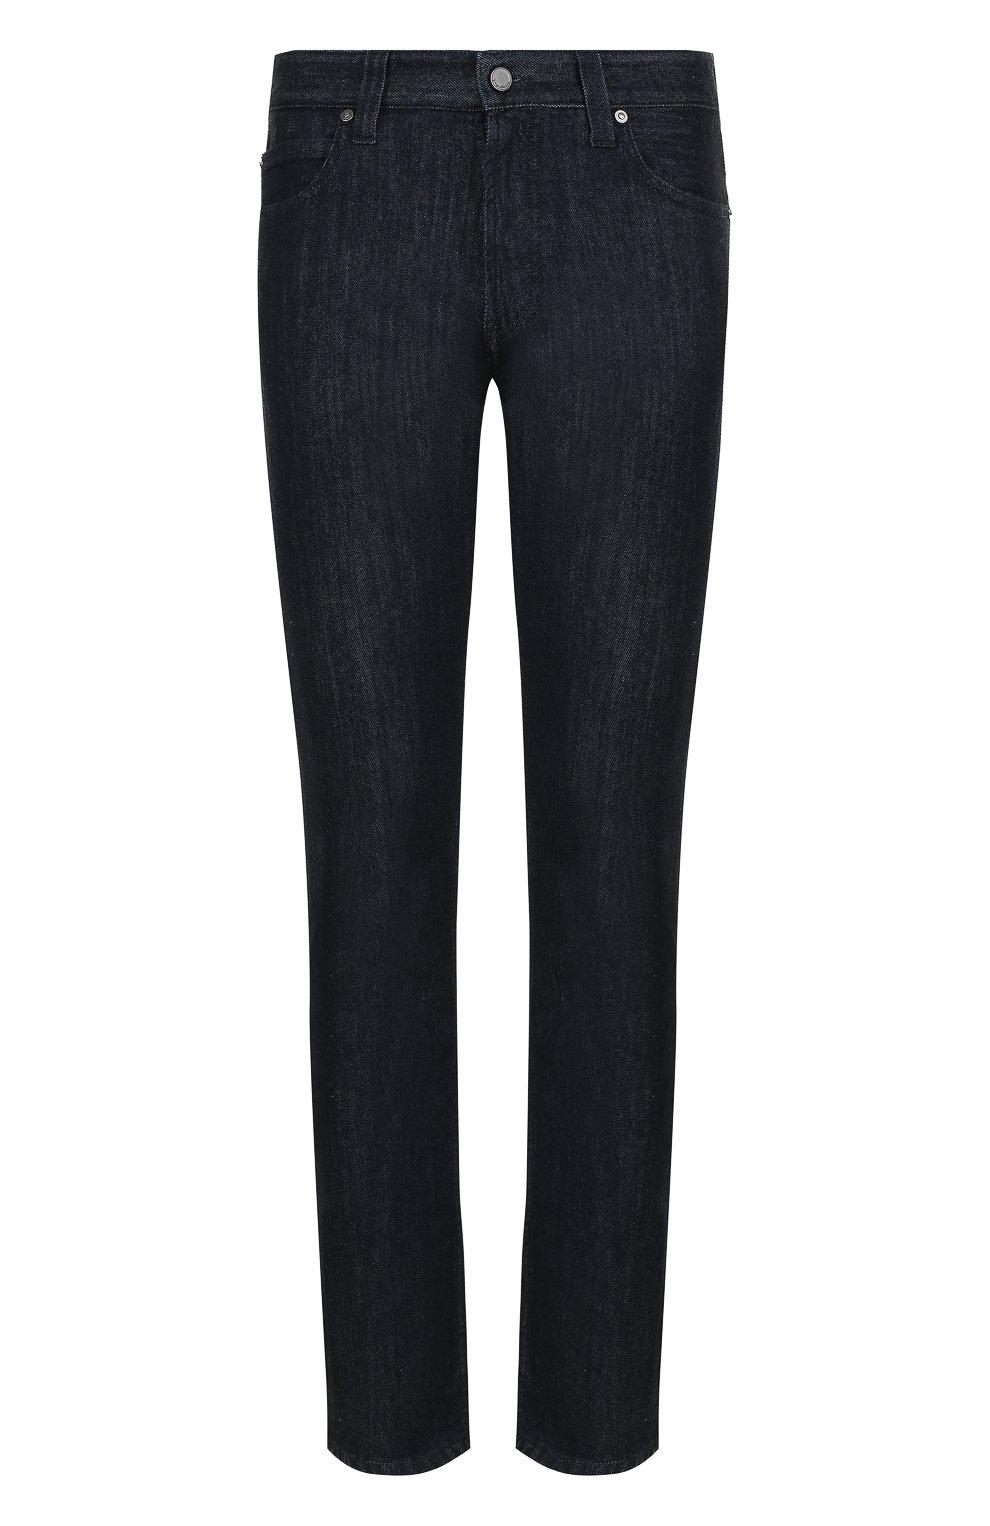 Мужские джинсы прямого кроя GIORGIO ARMANI синего цвета, арт. 6ZSJ15/SD30Z   Фото 1